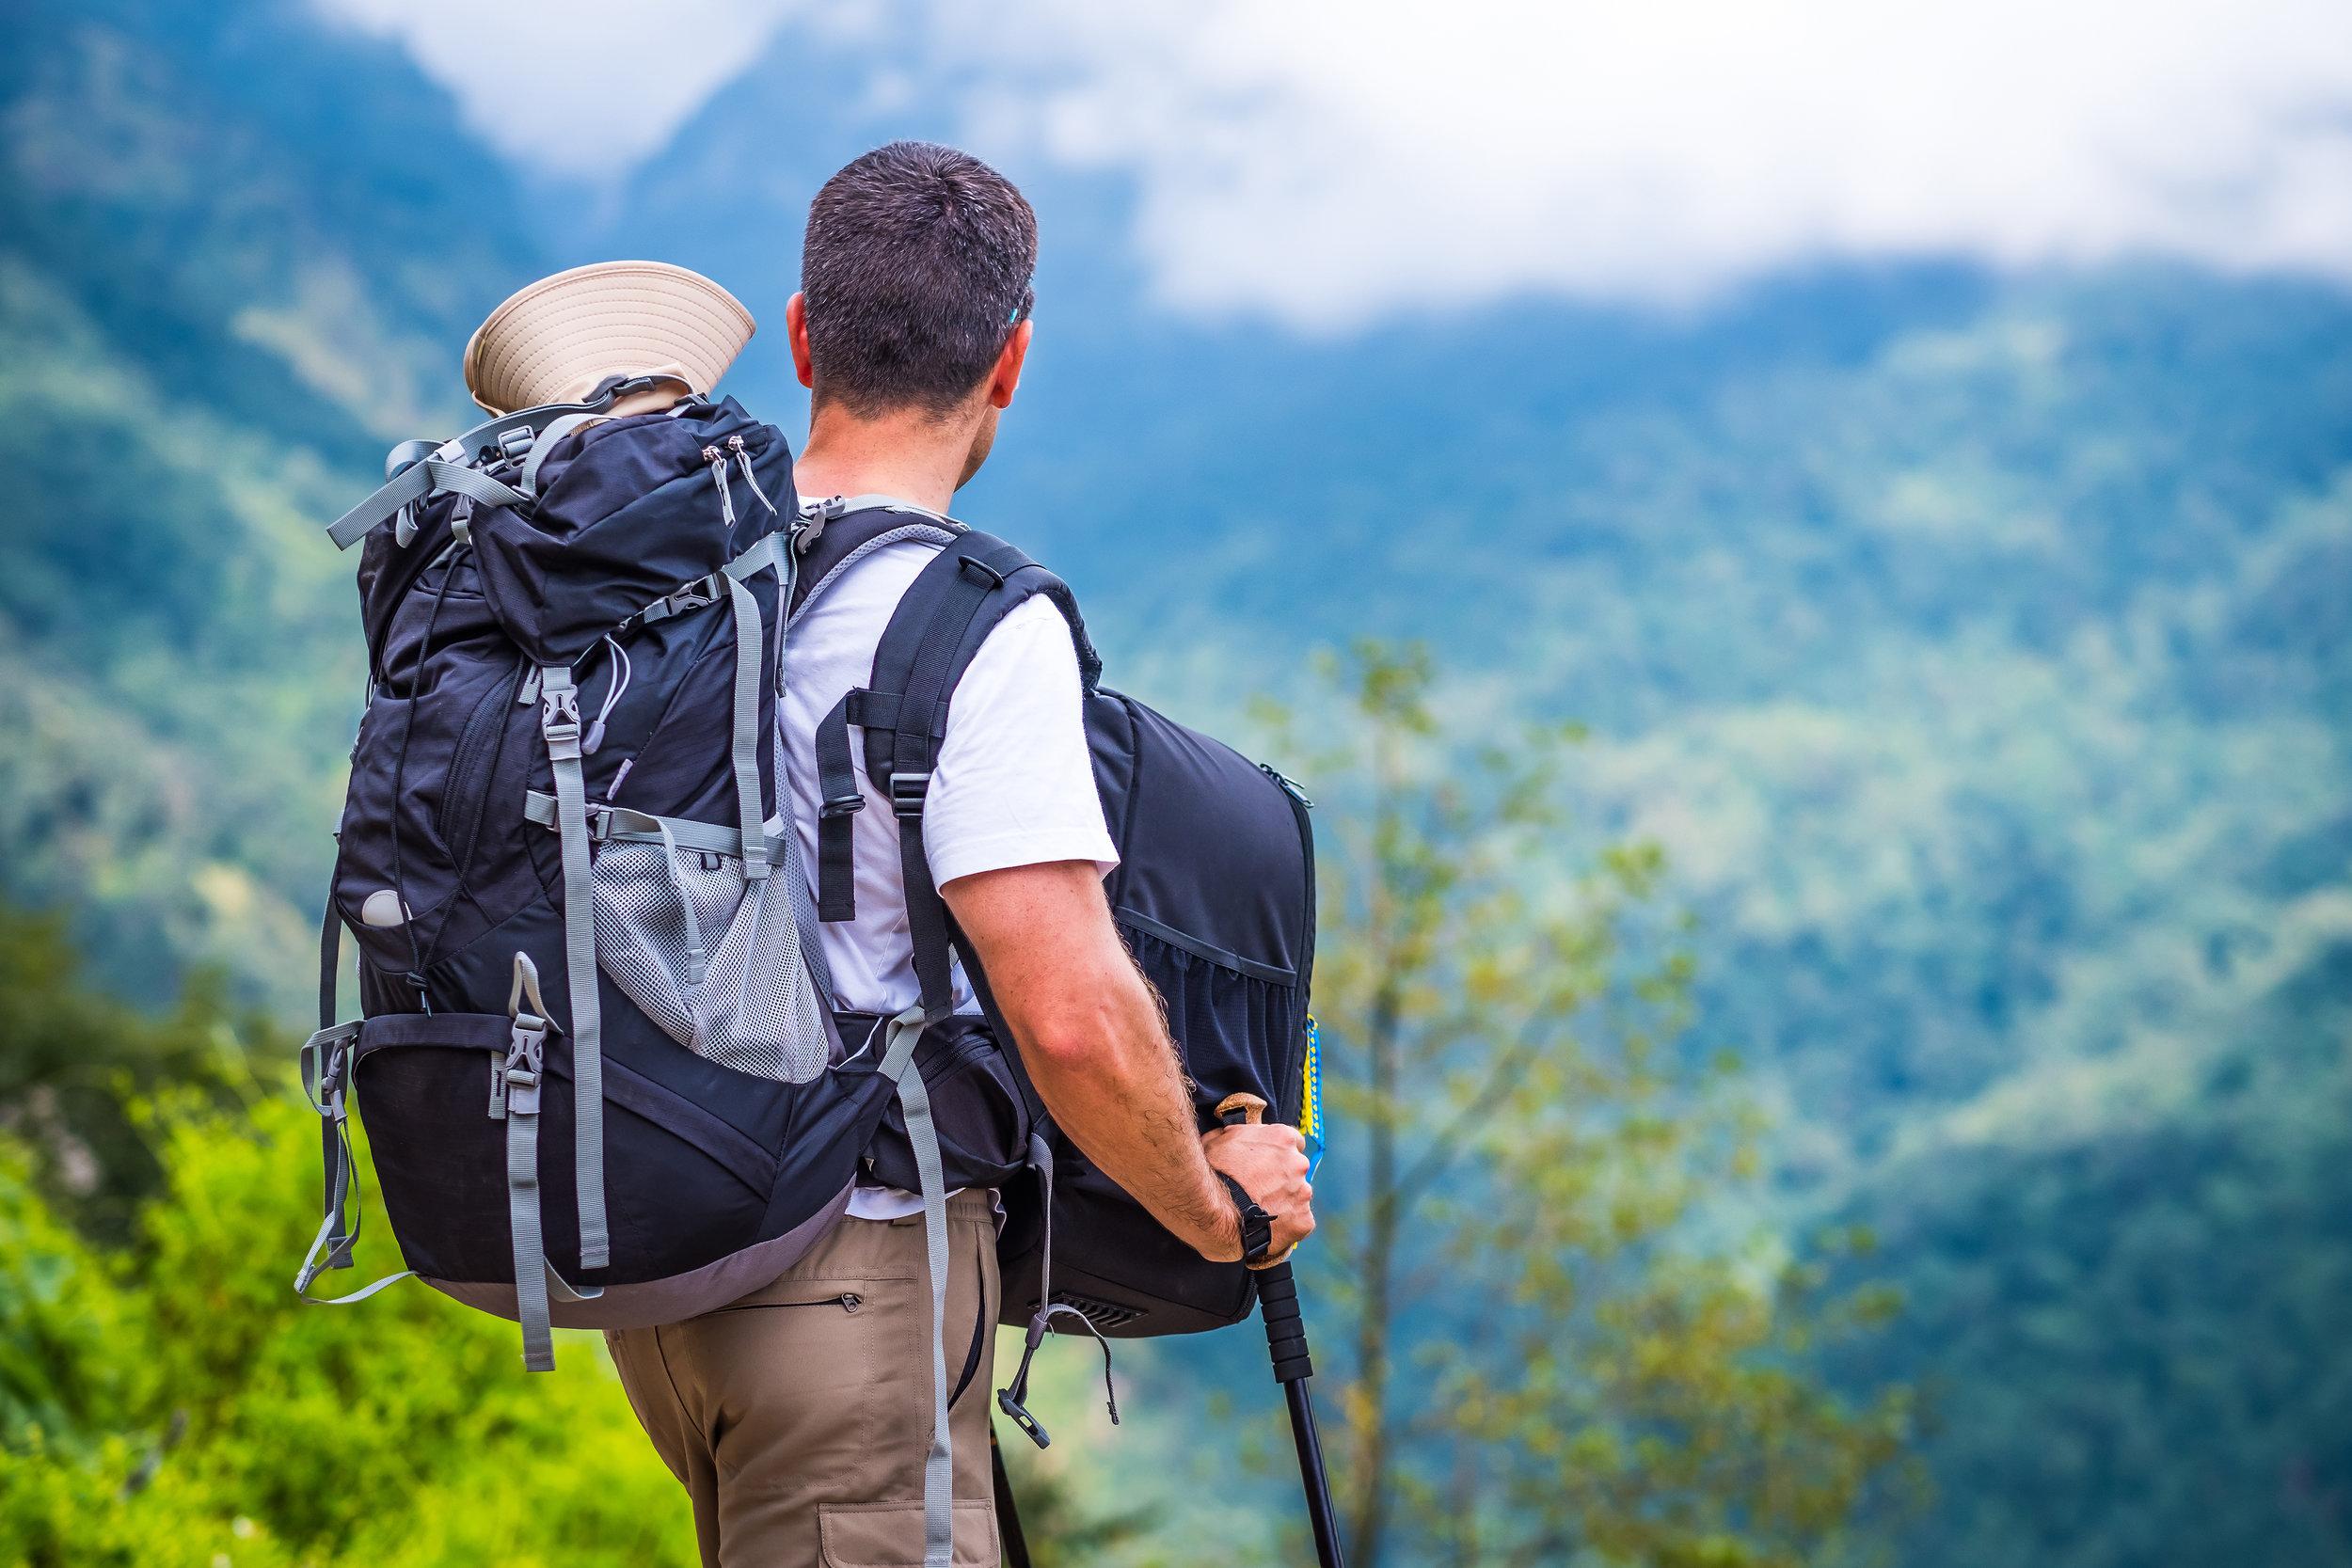 nepal_annapurna_bigstock-Tourist-with-huge-backpacks-en-224539018.jpg